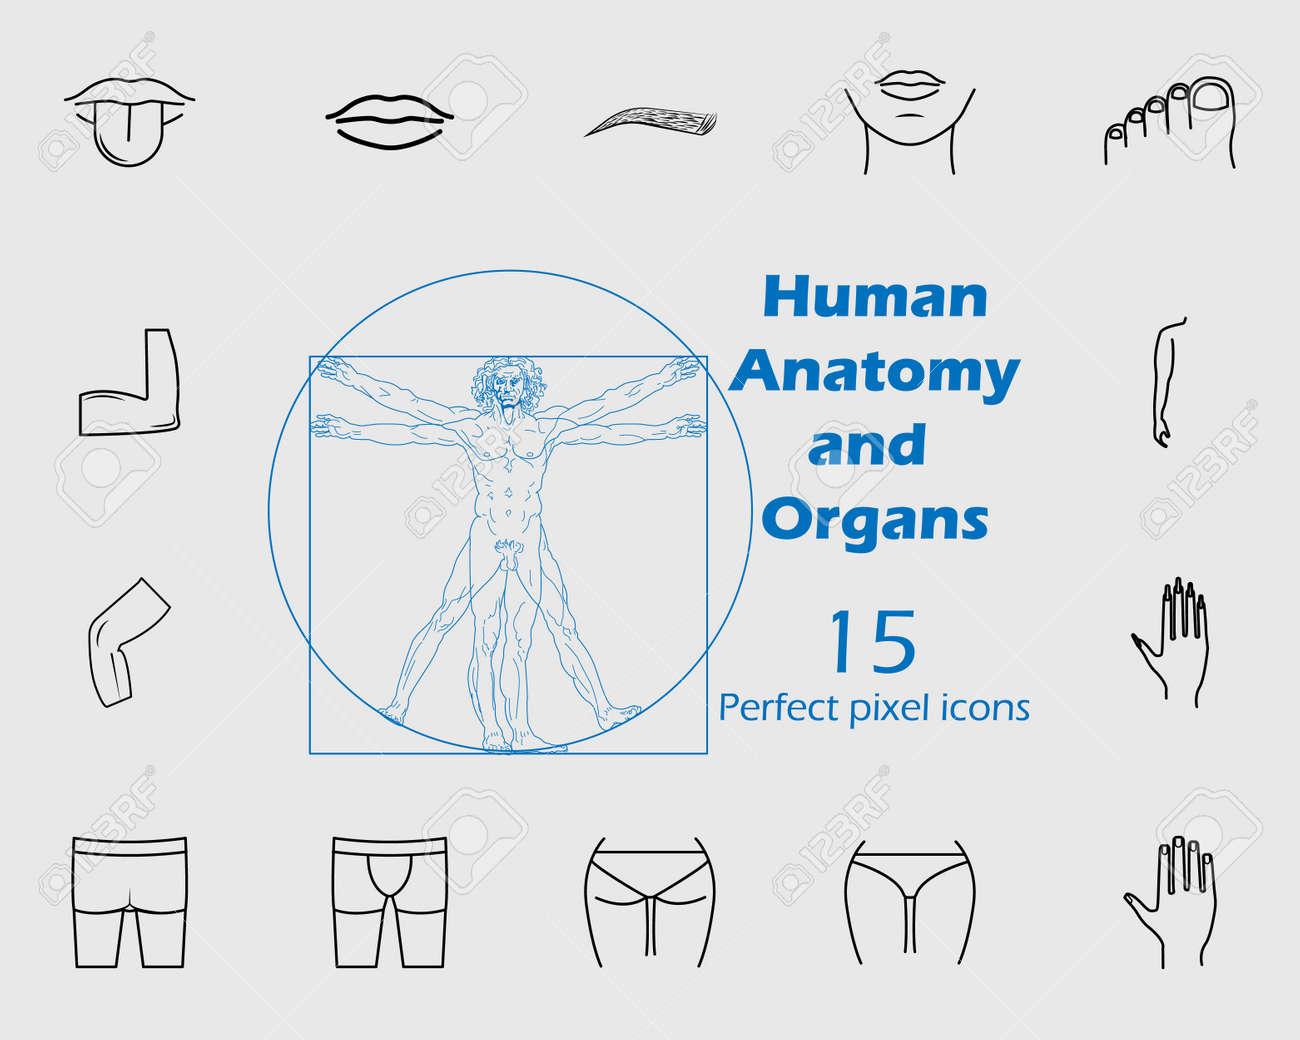 Human Anatomy Icon Set Premium Quality Graphic Design Signs